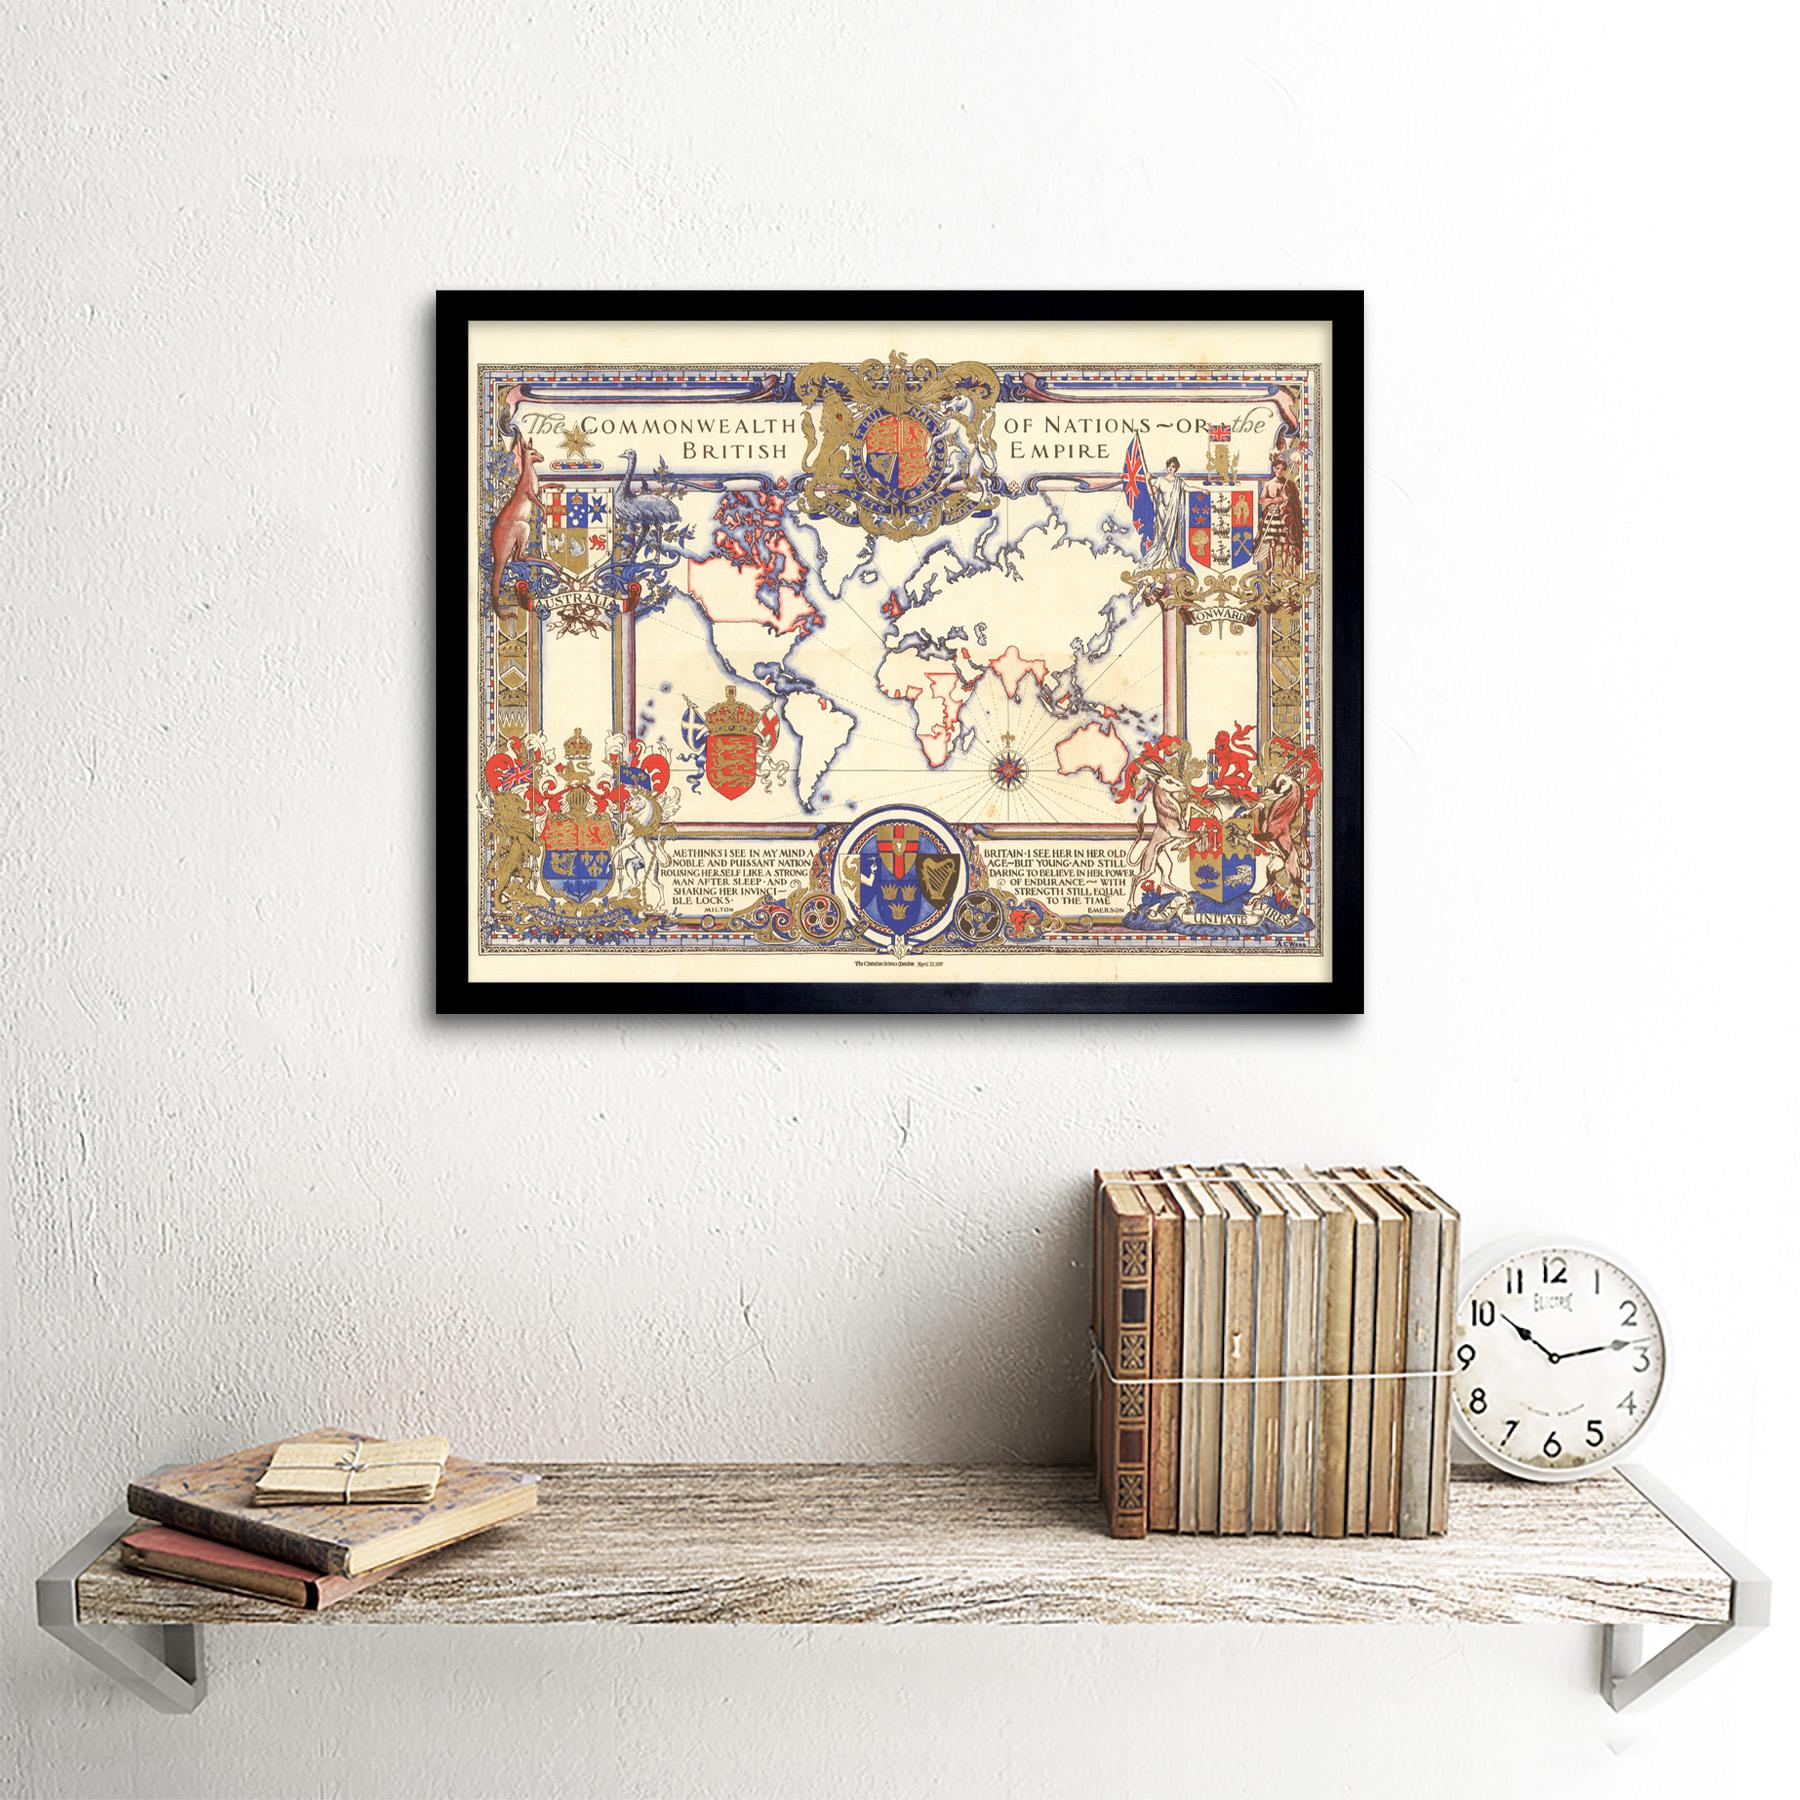 thumbnail 3 - Map-Webb-1937-British-Empire-Commonwealth-Pictorial-Wall-Art-Print-Framed-12x16